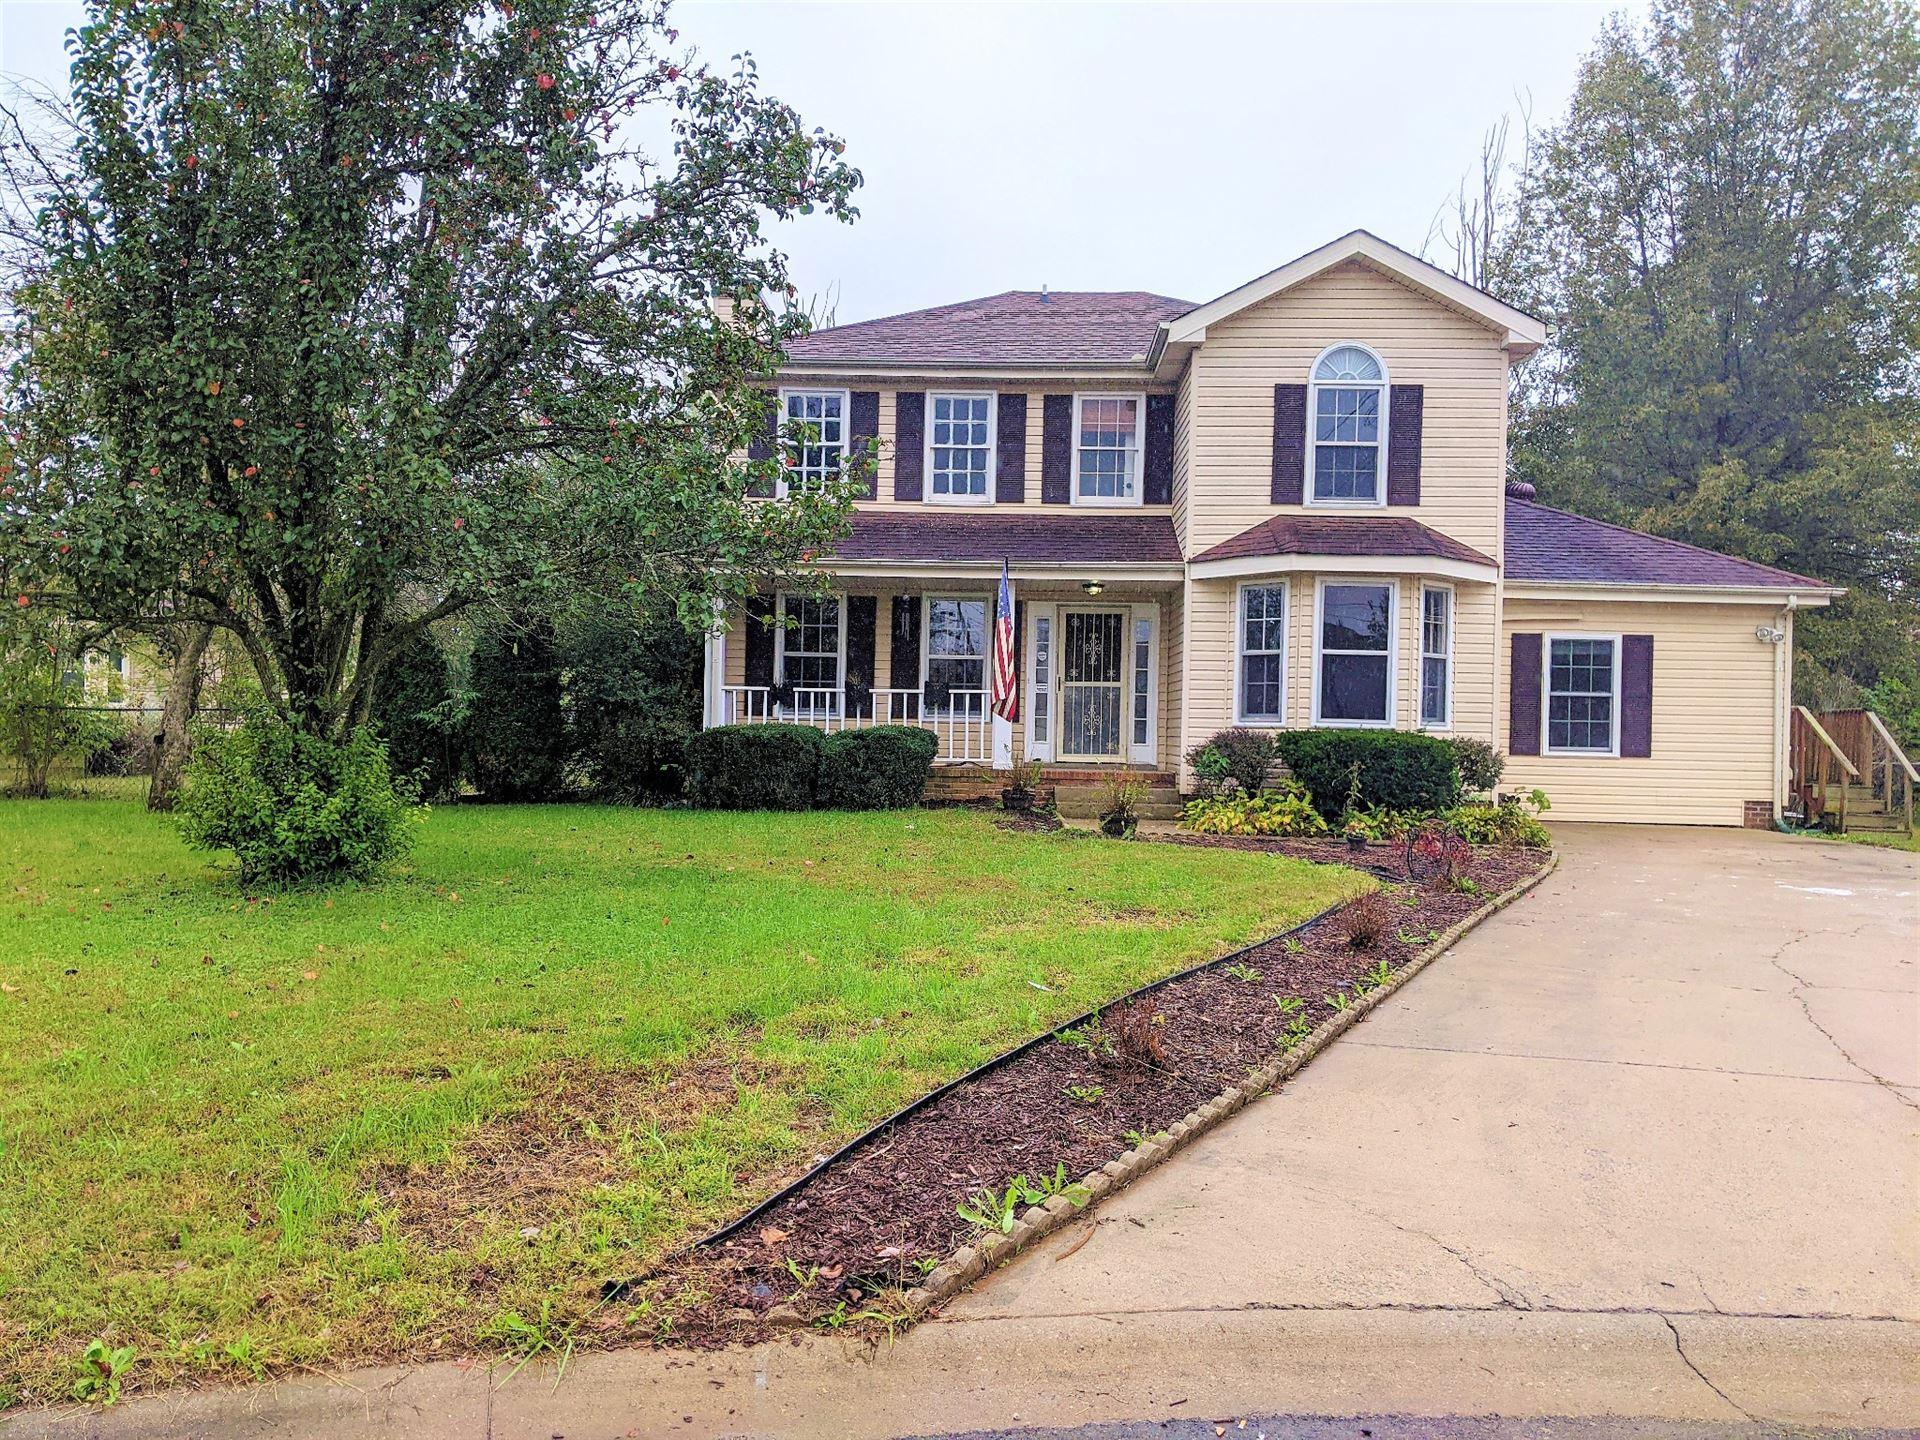 810 Keystone Ct, Clarksville, TN 37042 - MLS#: 2202946